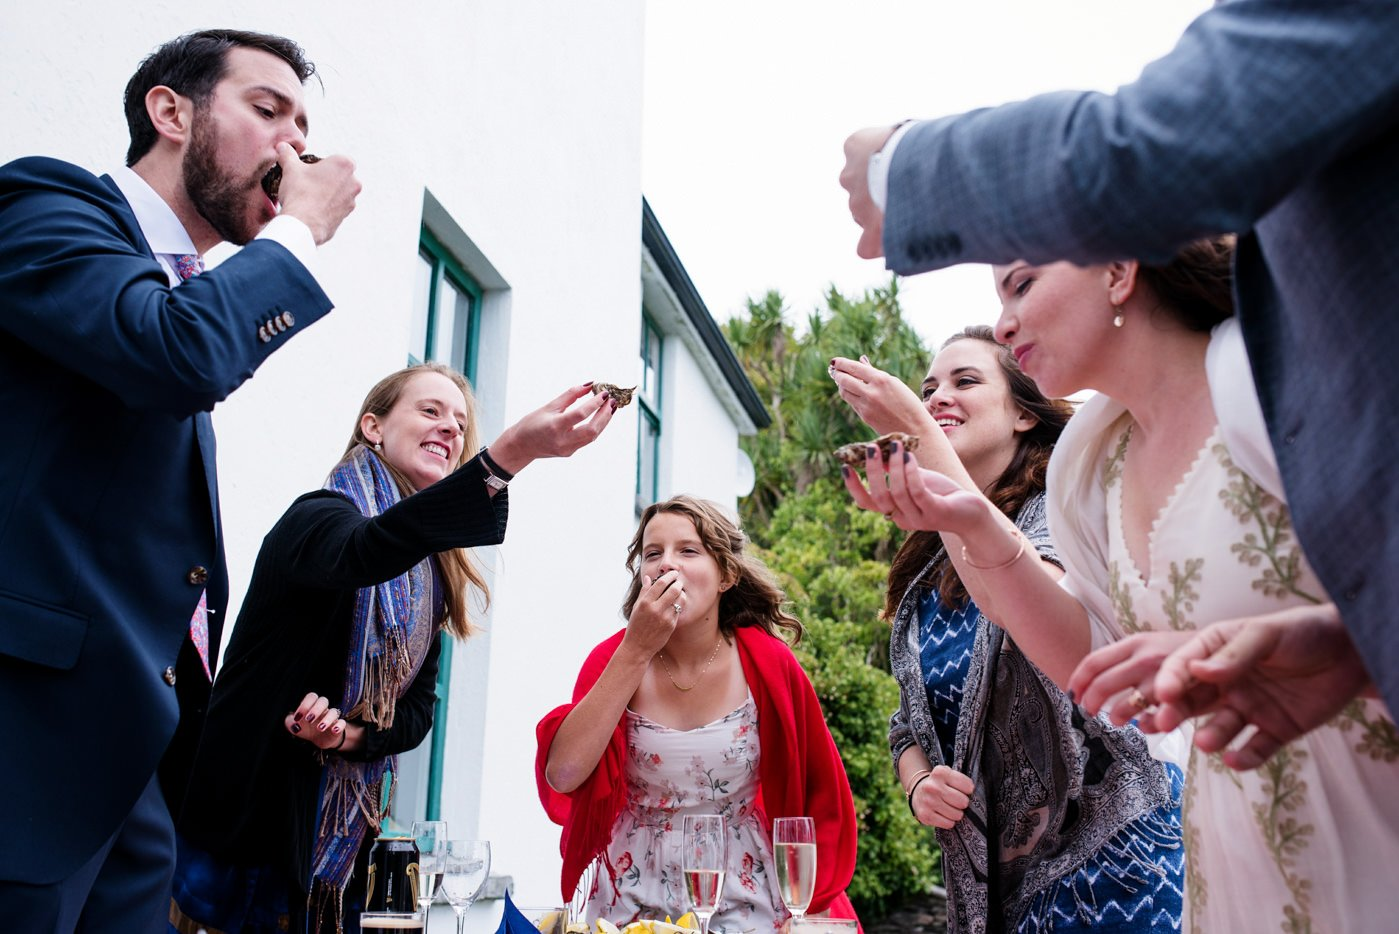 Oyster toast outdoor bohemian wedding Co Kerry Ireland